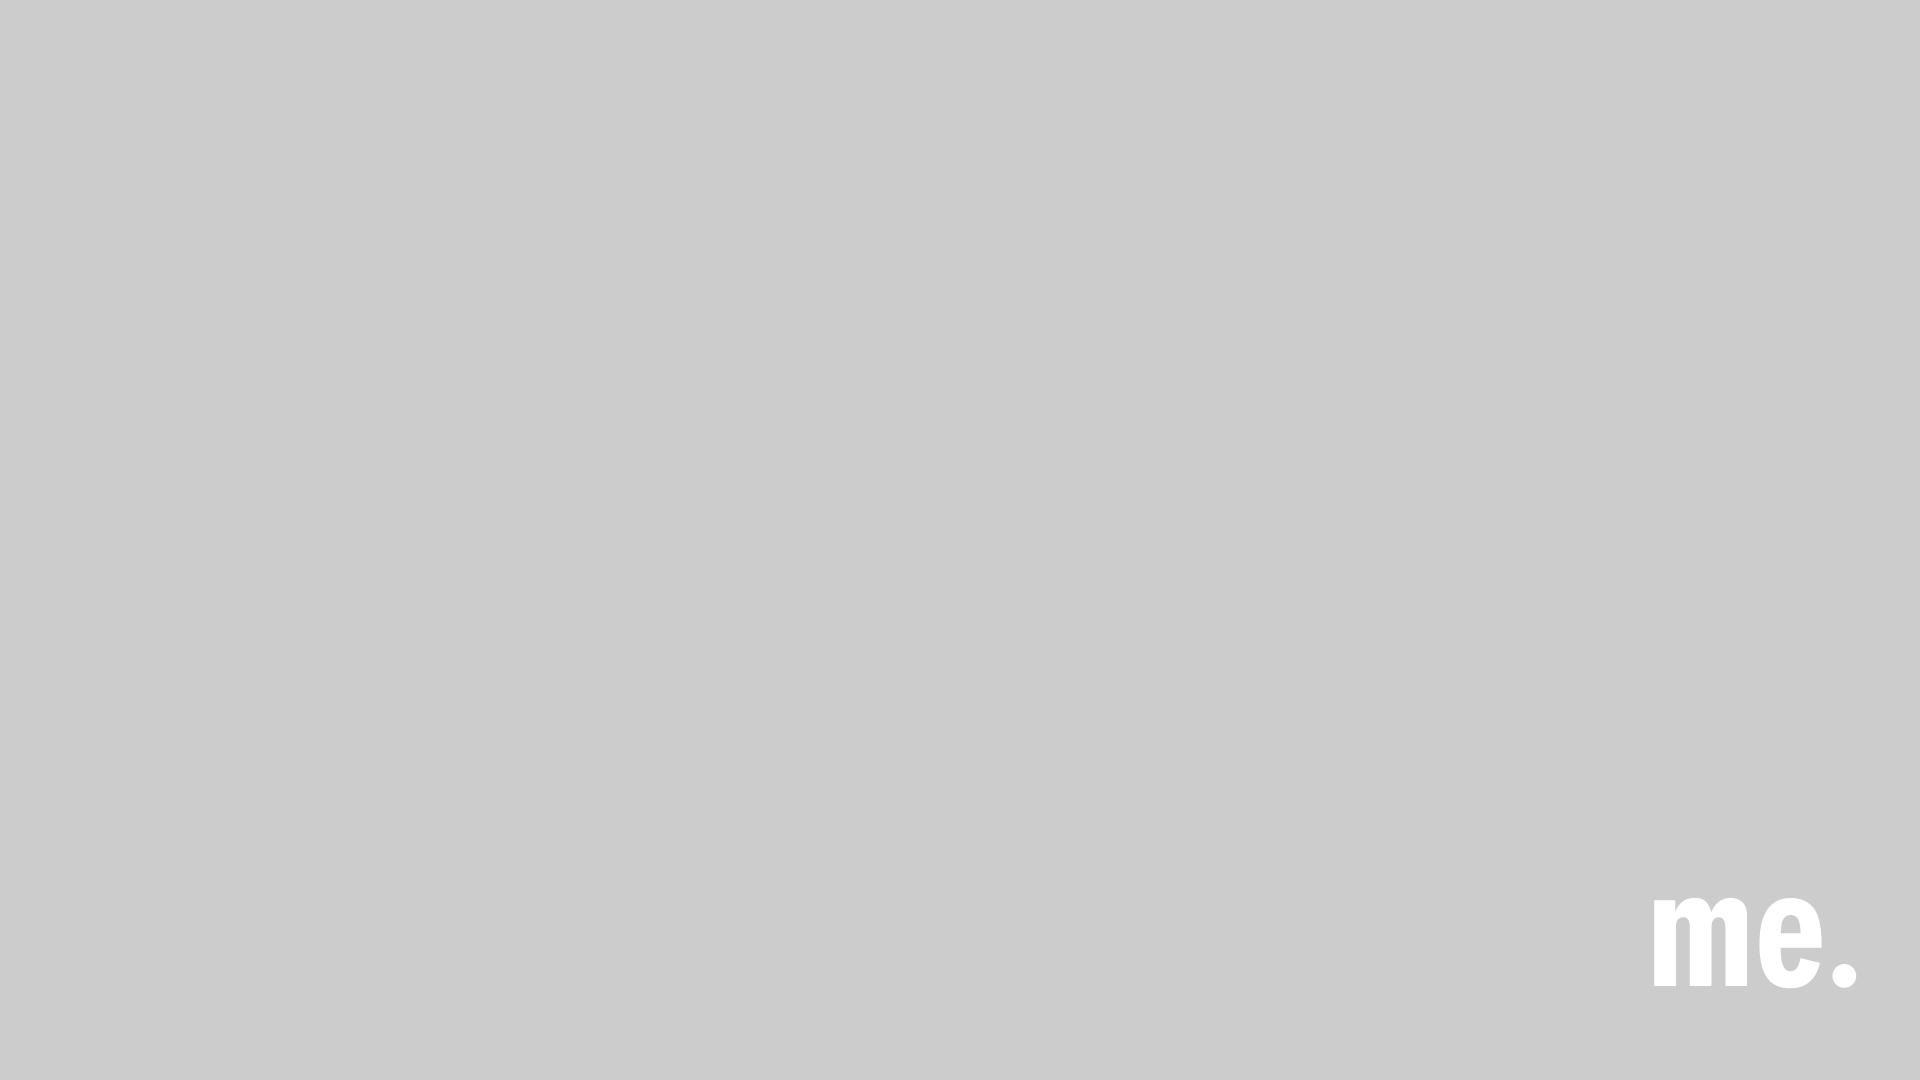 14. Brad Paisley - 12,848,724.84 US-Dollar